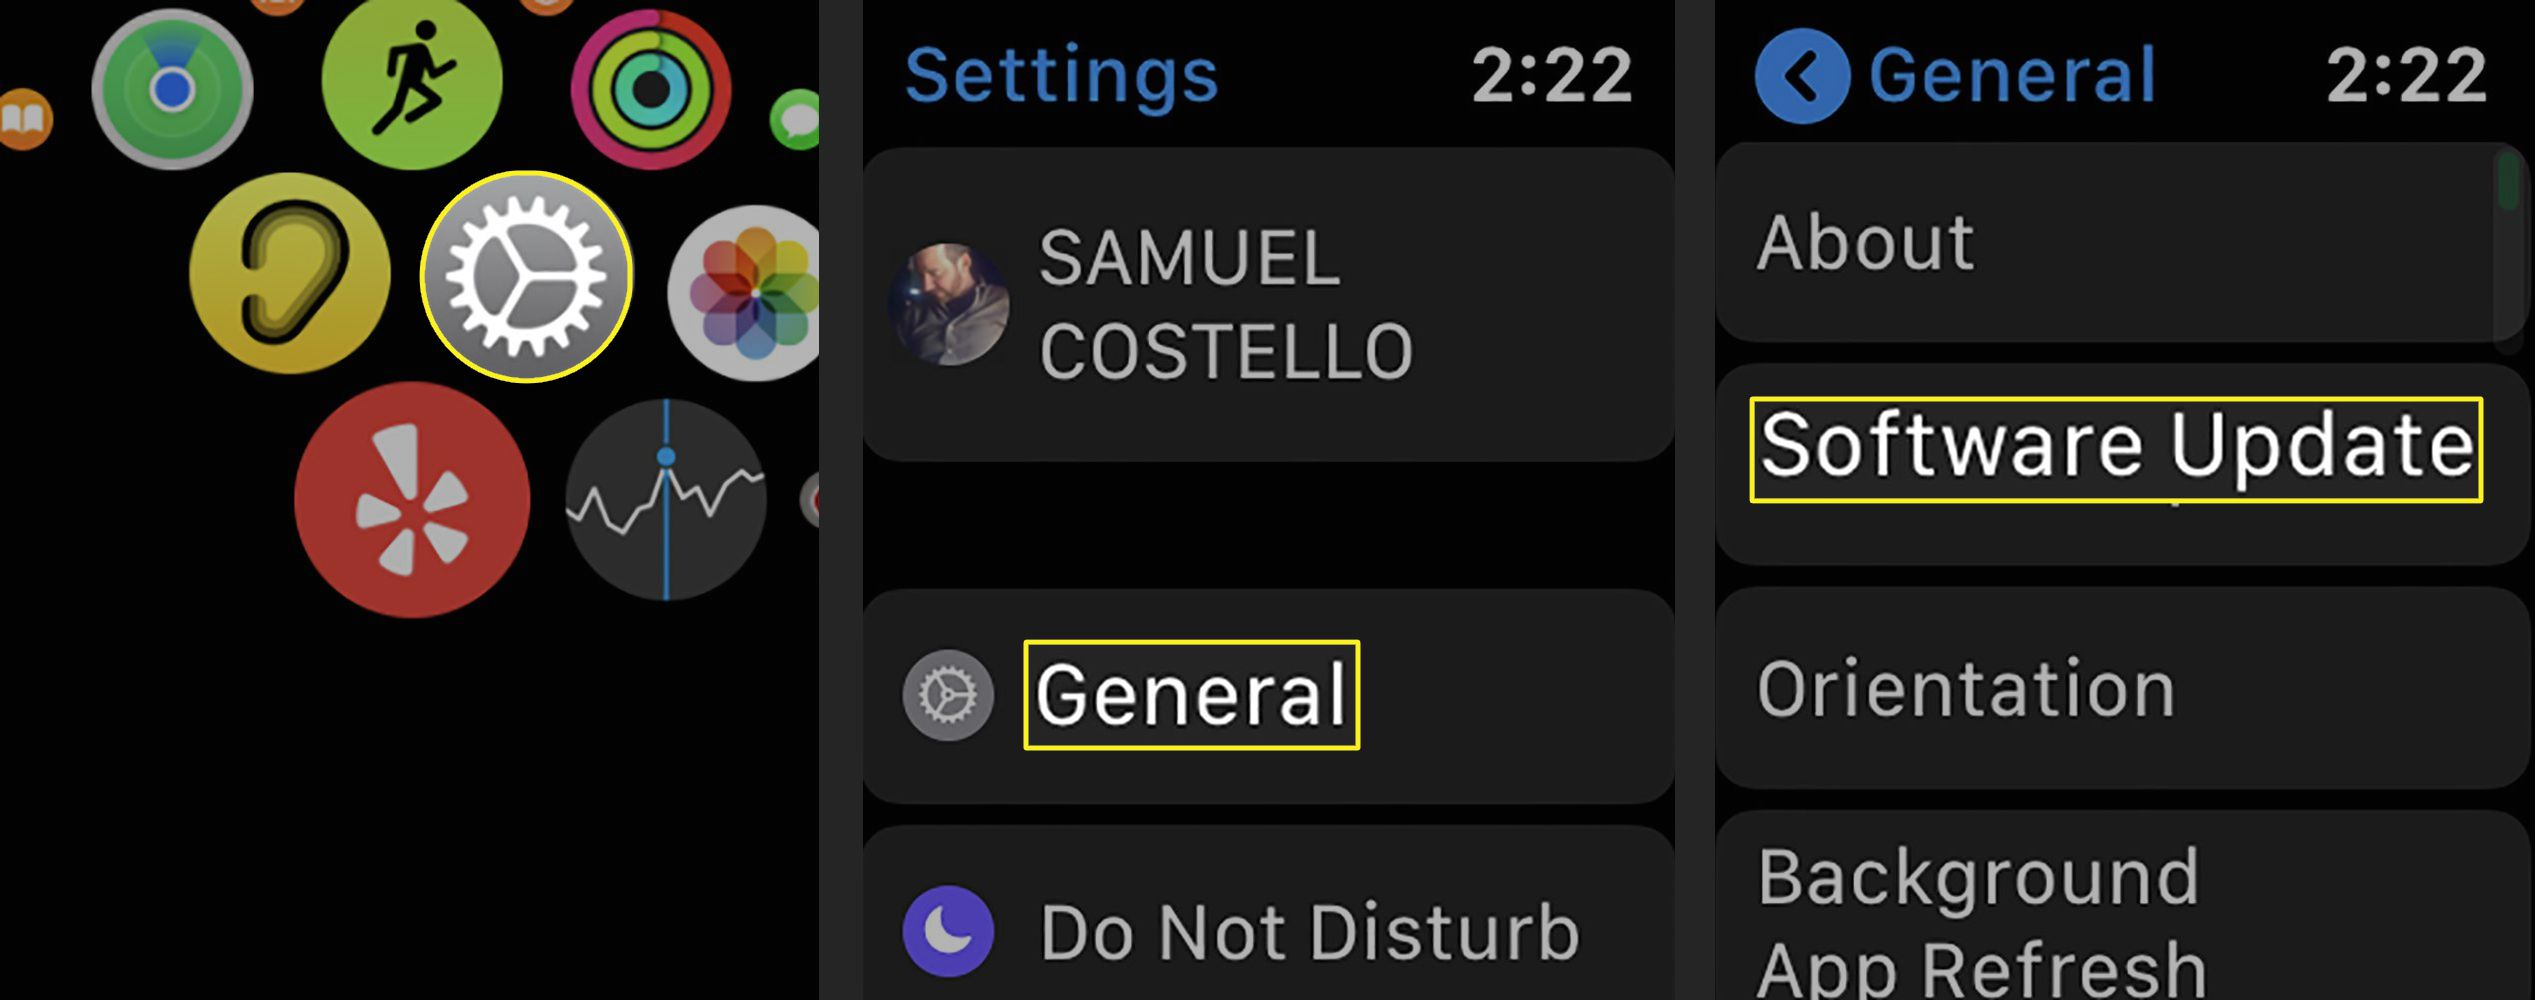 Screenshots of updating software on Apple Watch